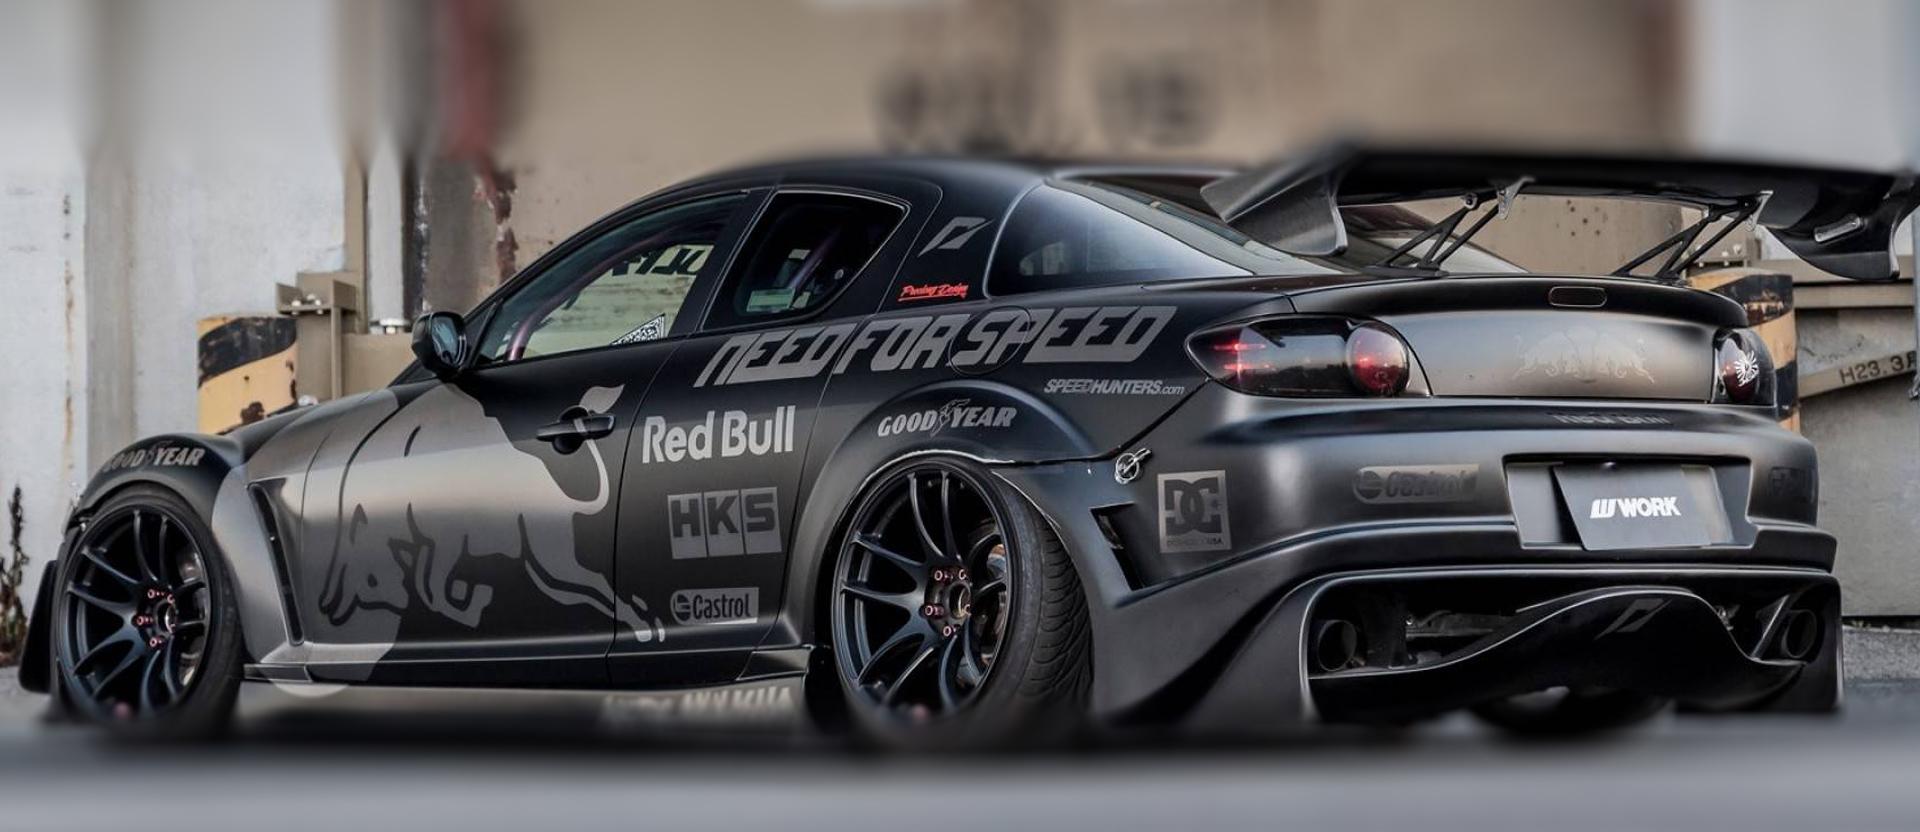 WRC Rx8